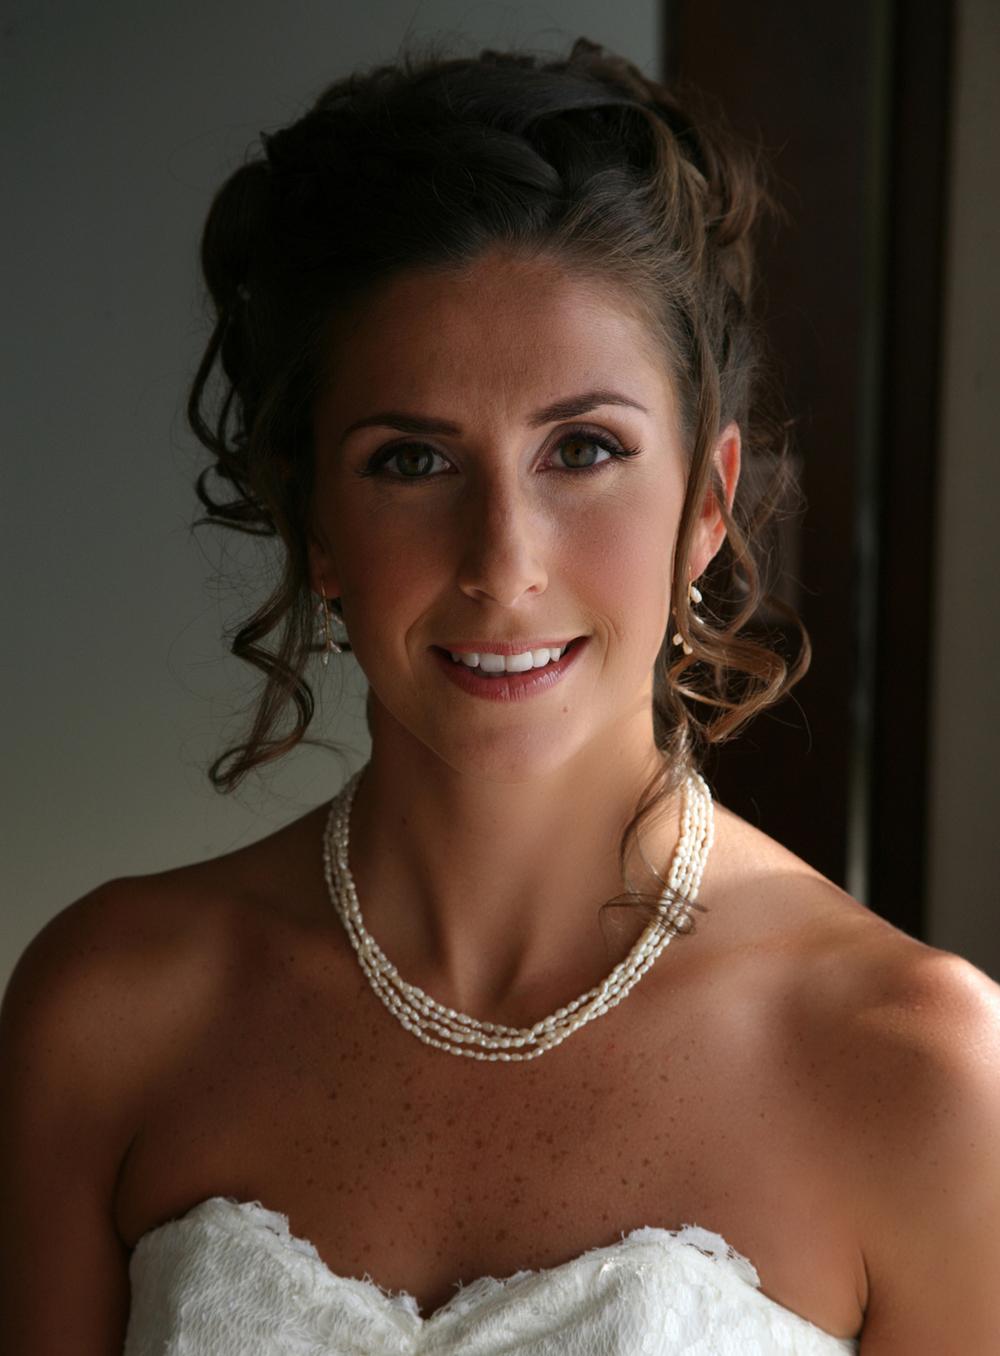 bridal-hair-makeup-natural-makeup-bride-freckles-curly-updo-loose-romantic-smoky.jpg